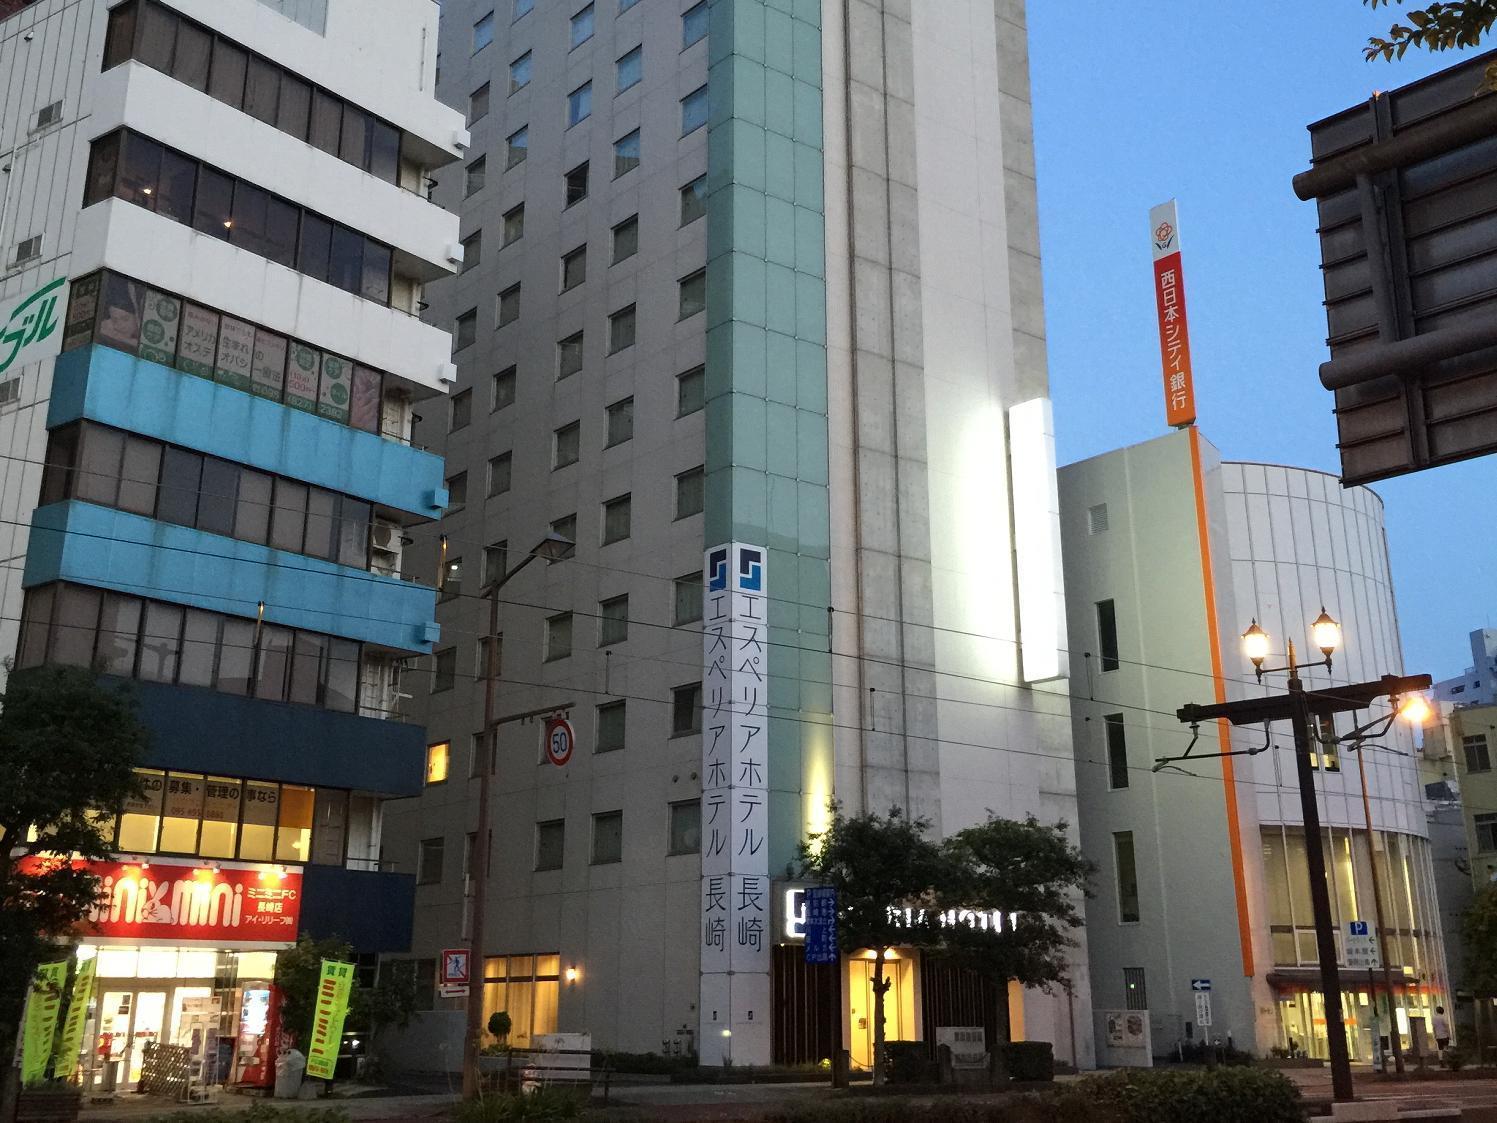 sasebo japan társkereső oldal